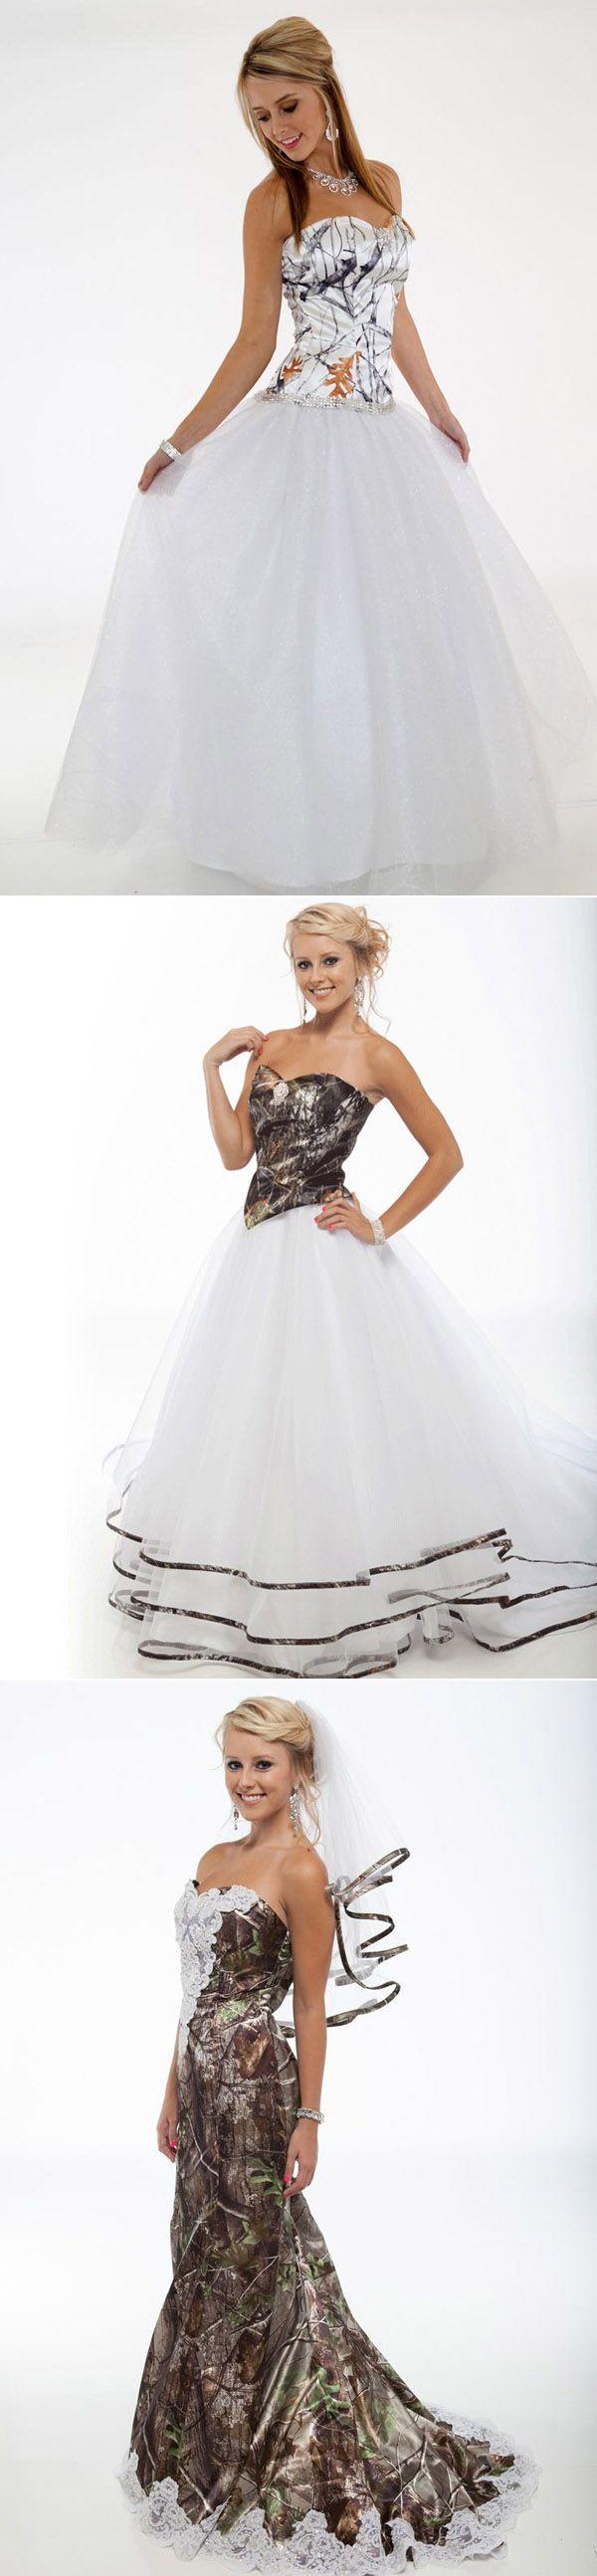 gorgeous white and camo wedding dresses for camo weddings